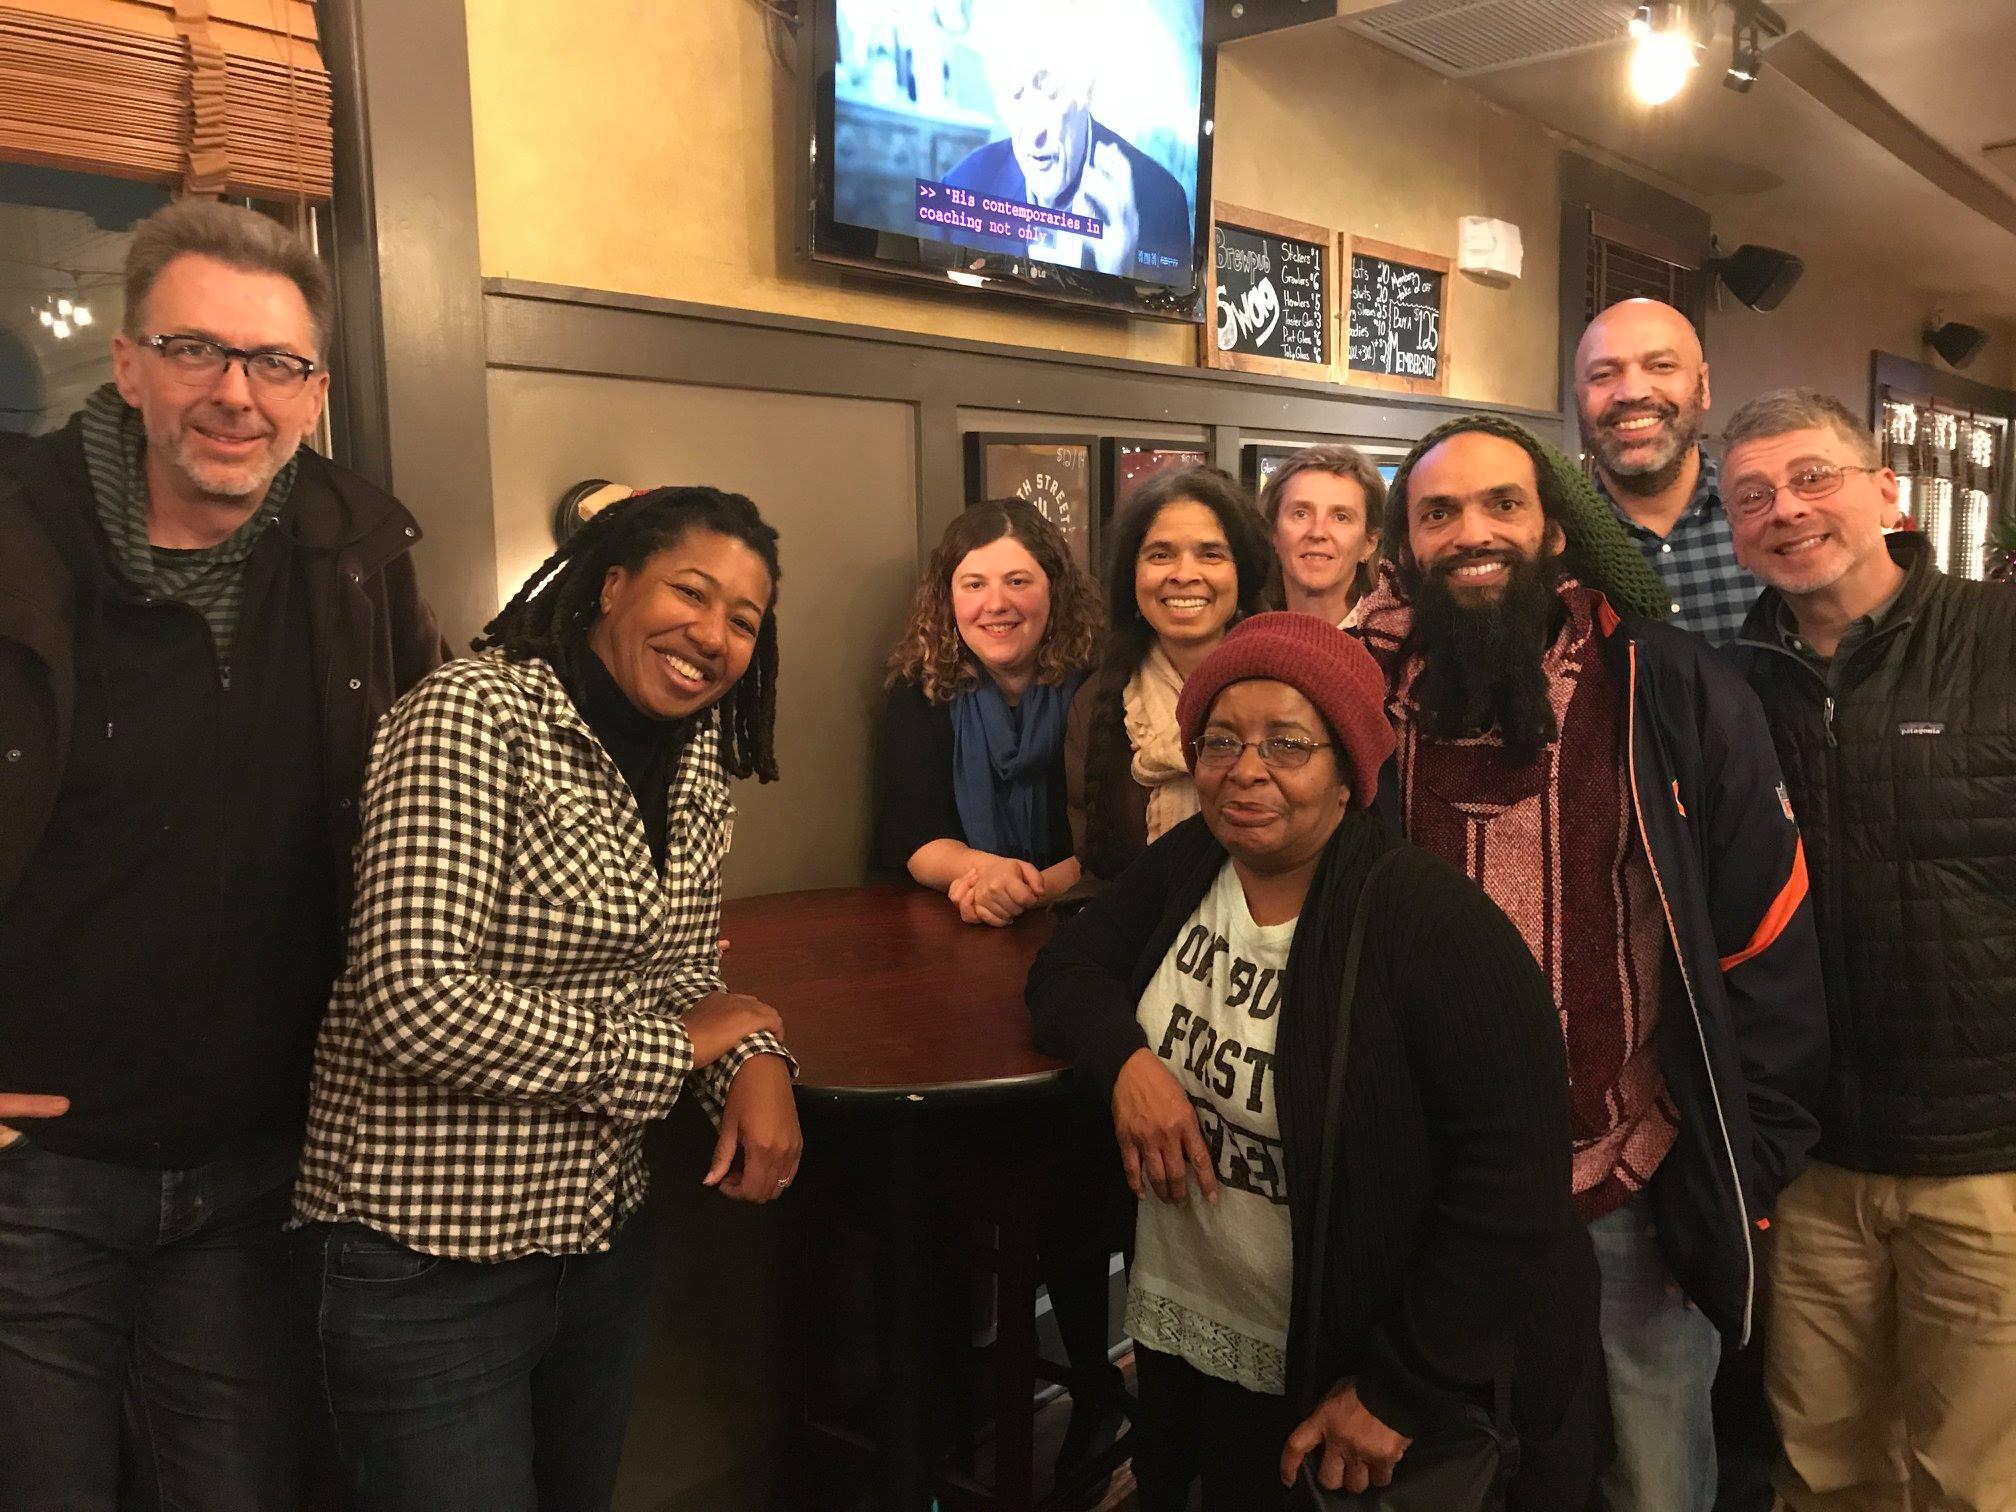 group photo of members of co-op dayton